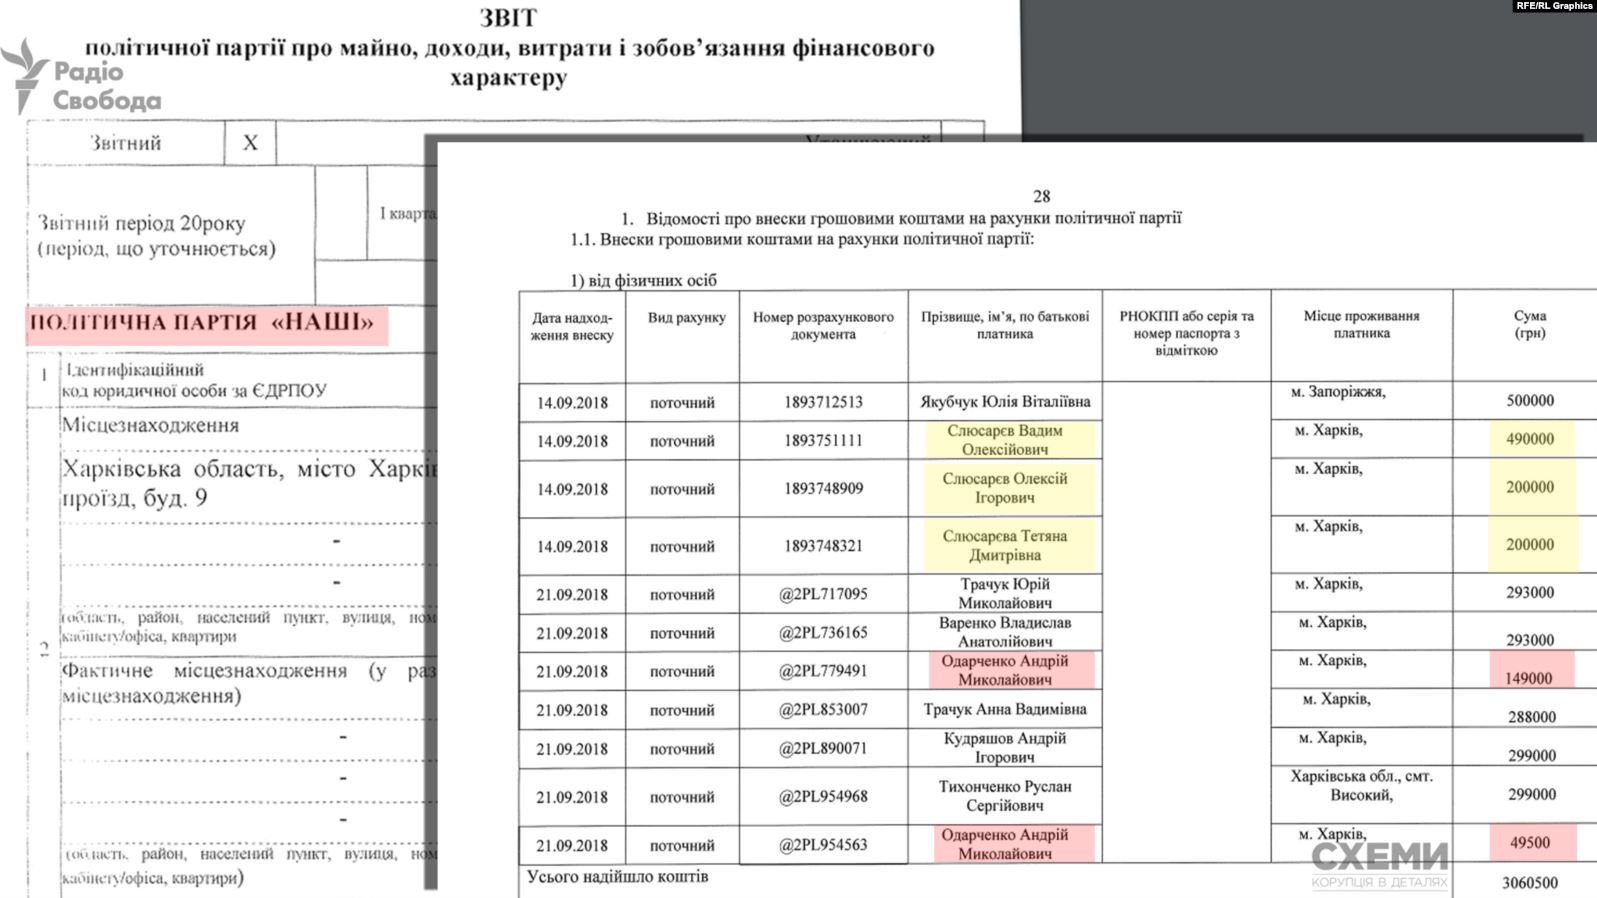 Отчет о финансировании партии Наши Евгения Мураева